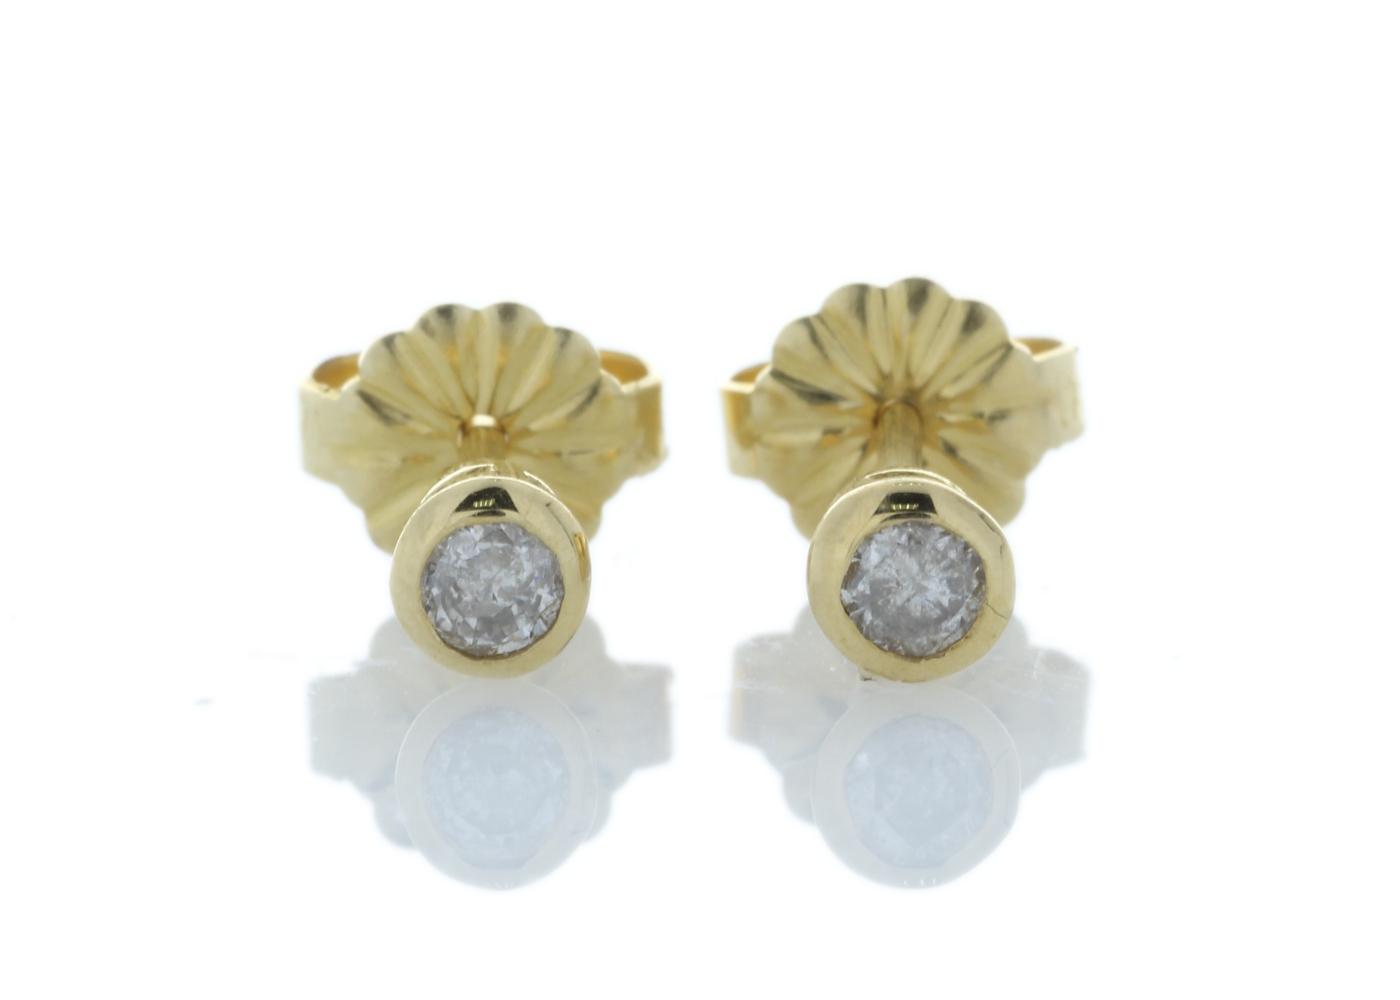 Lot 6 - 18ct Yellow Gold Single Stone Rub Over Set Diamond Earring 0.33 Carats